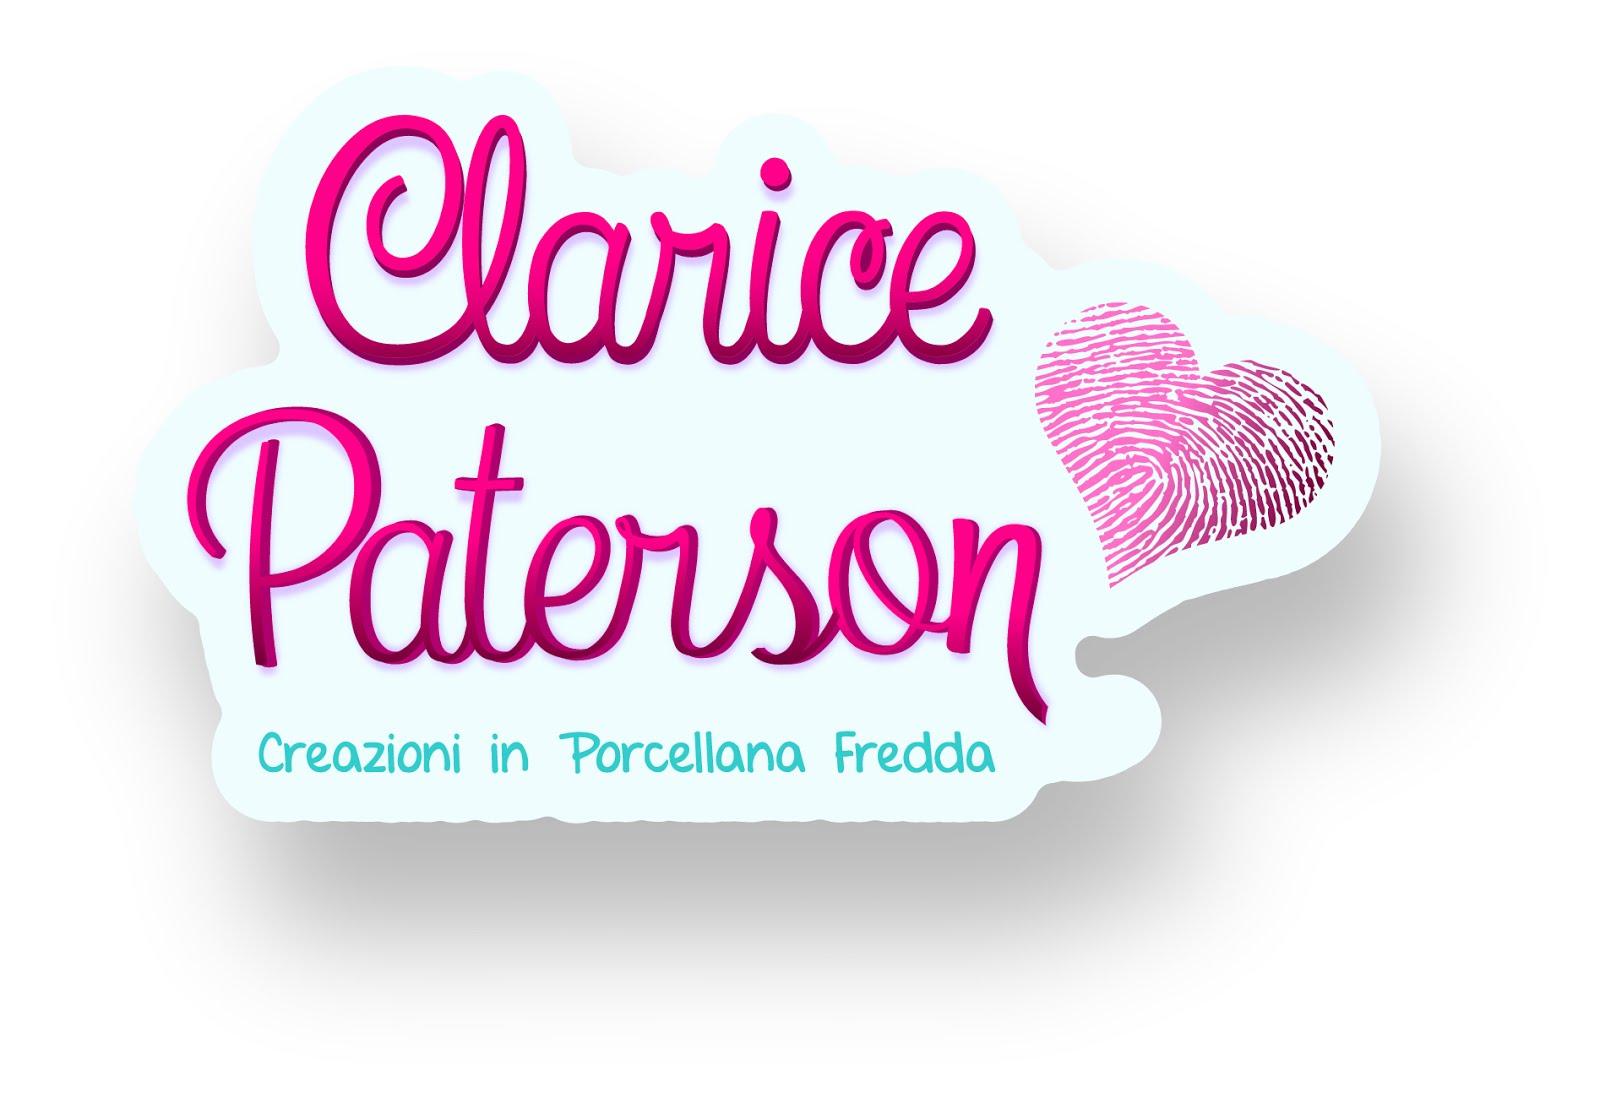 Clarice Paterson